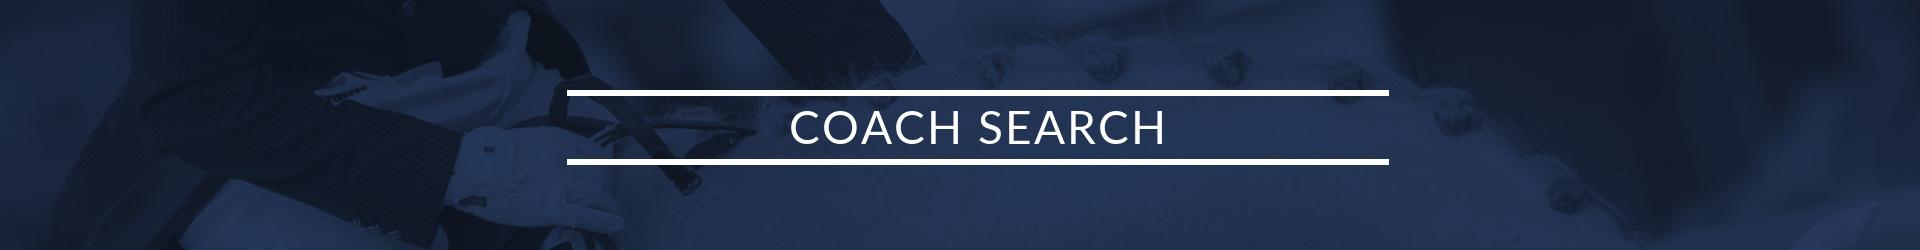 Coach search